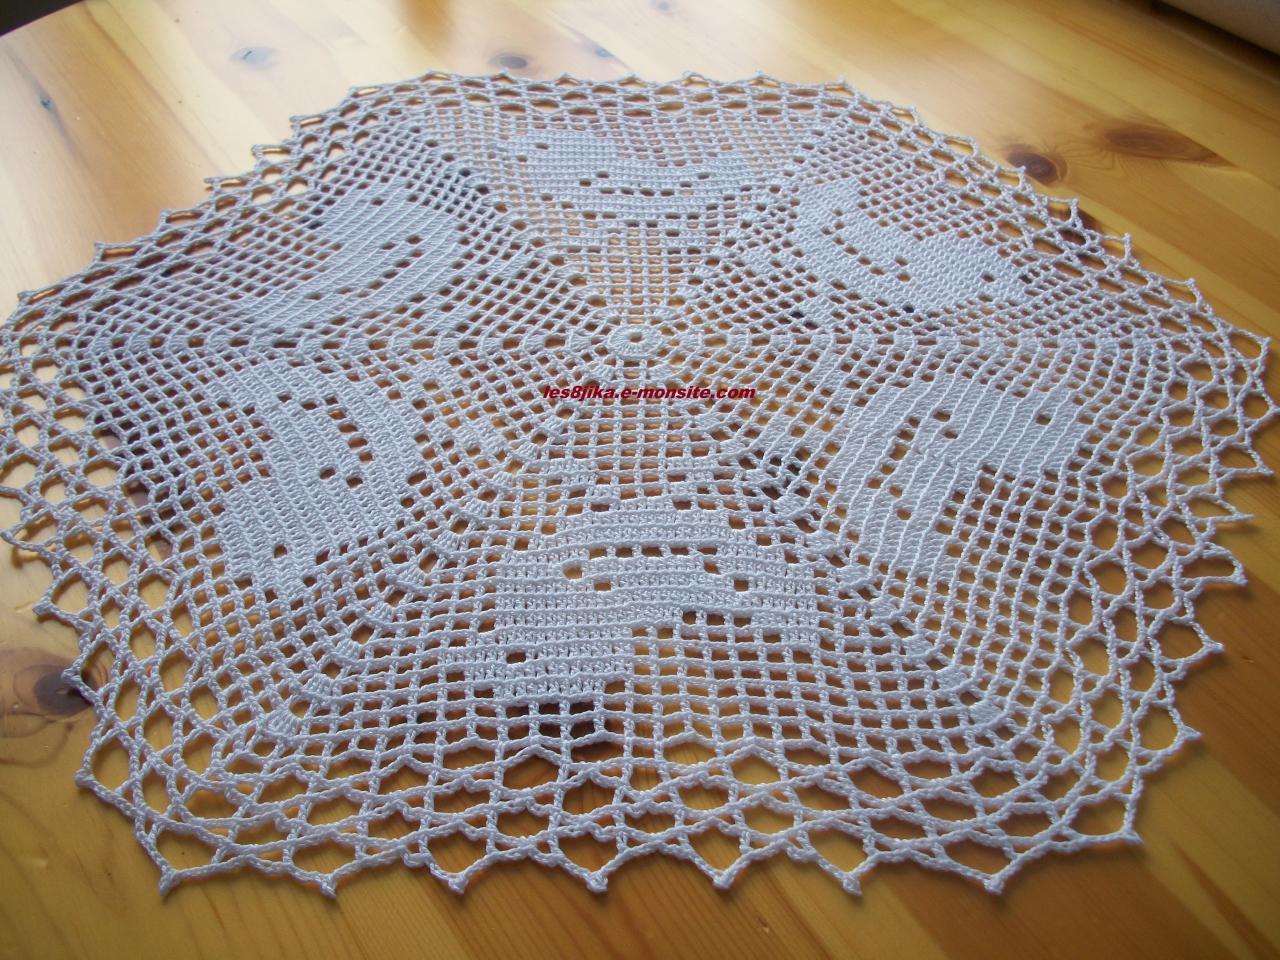 Napperon modeles gratuits crochet d art - Napperon crochet chemin de table ...